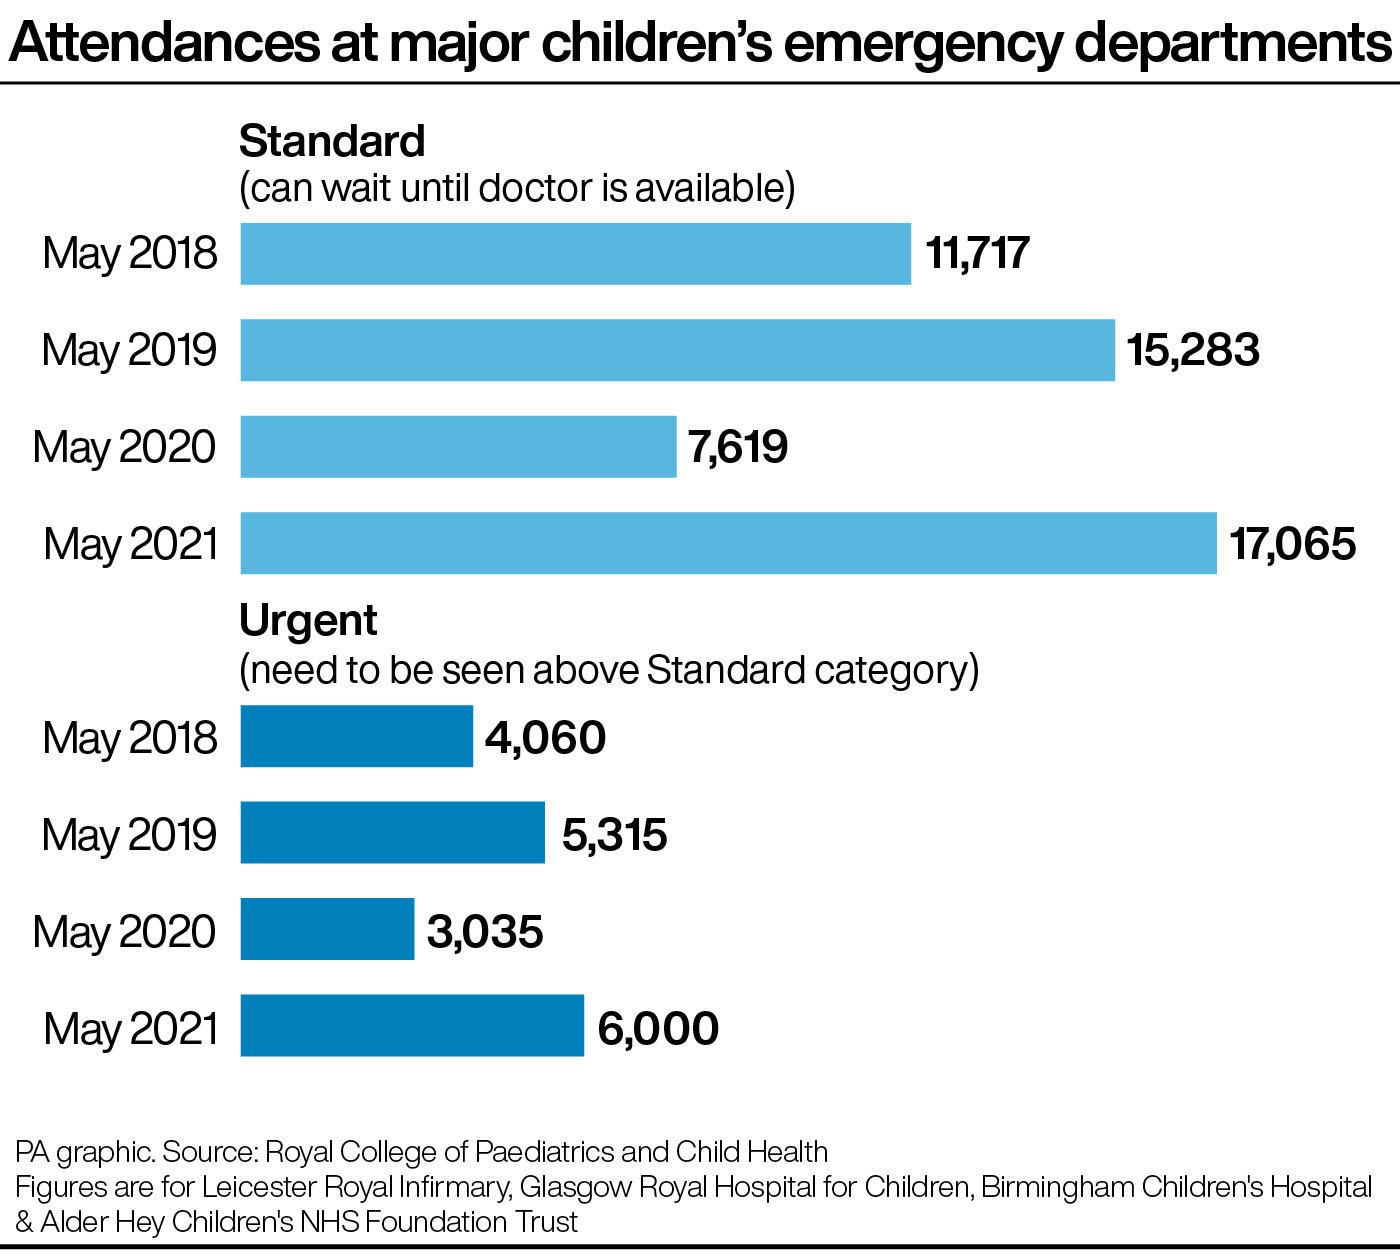 Attendances at major children's emergency departments